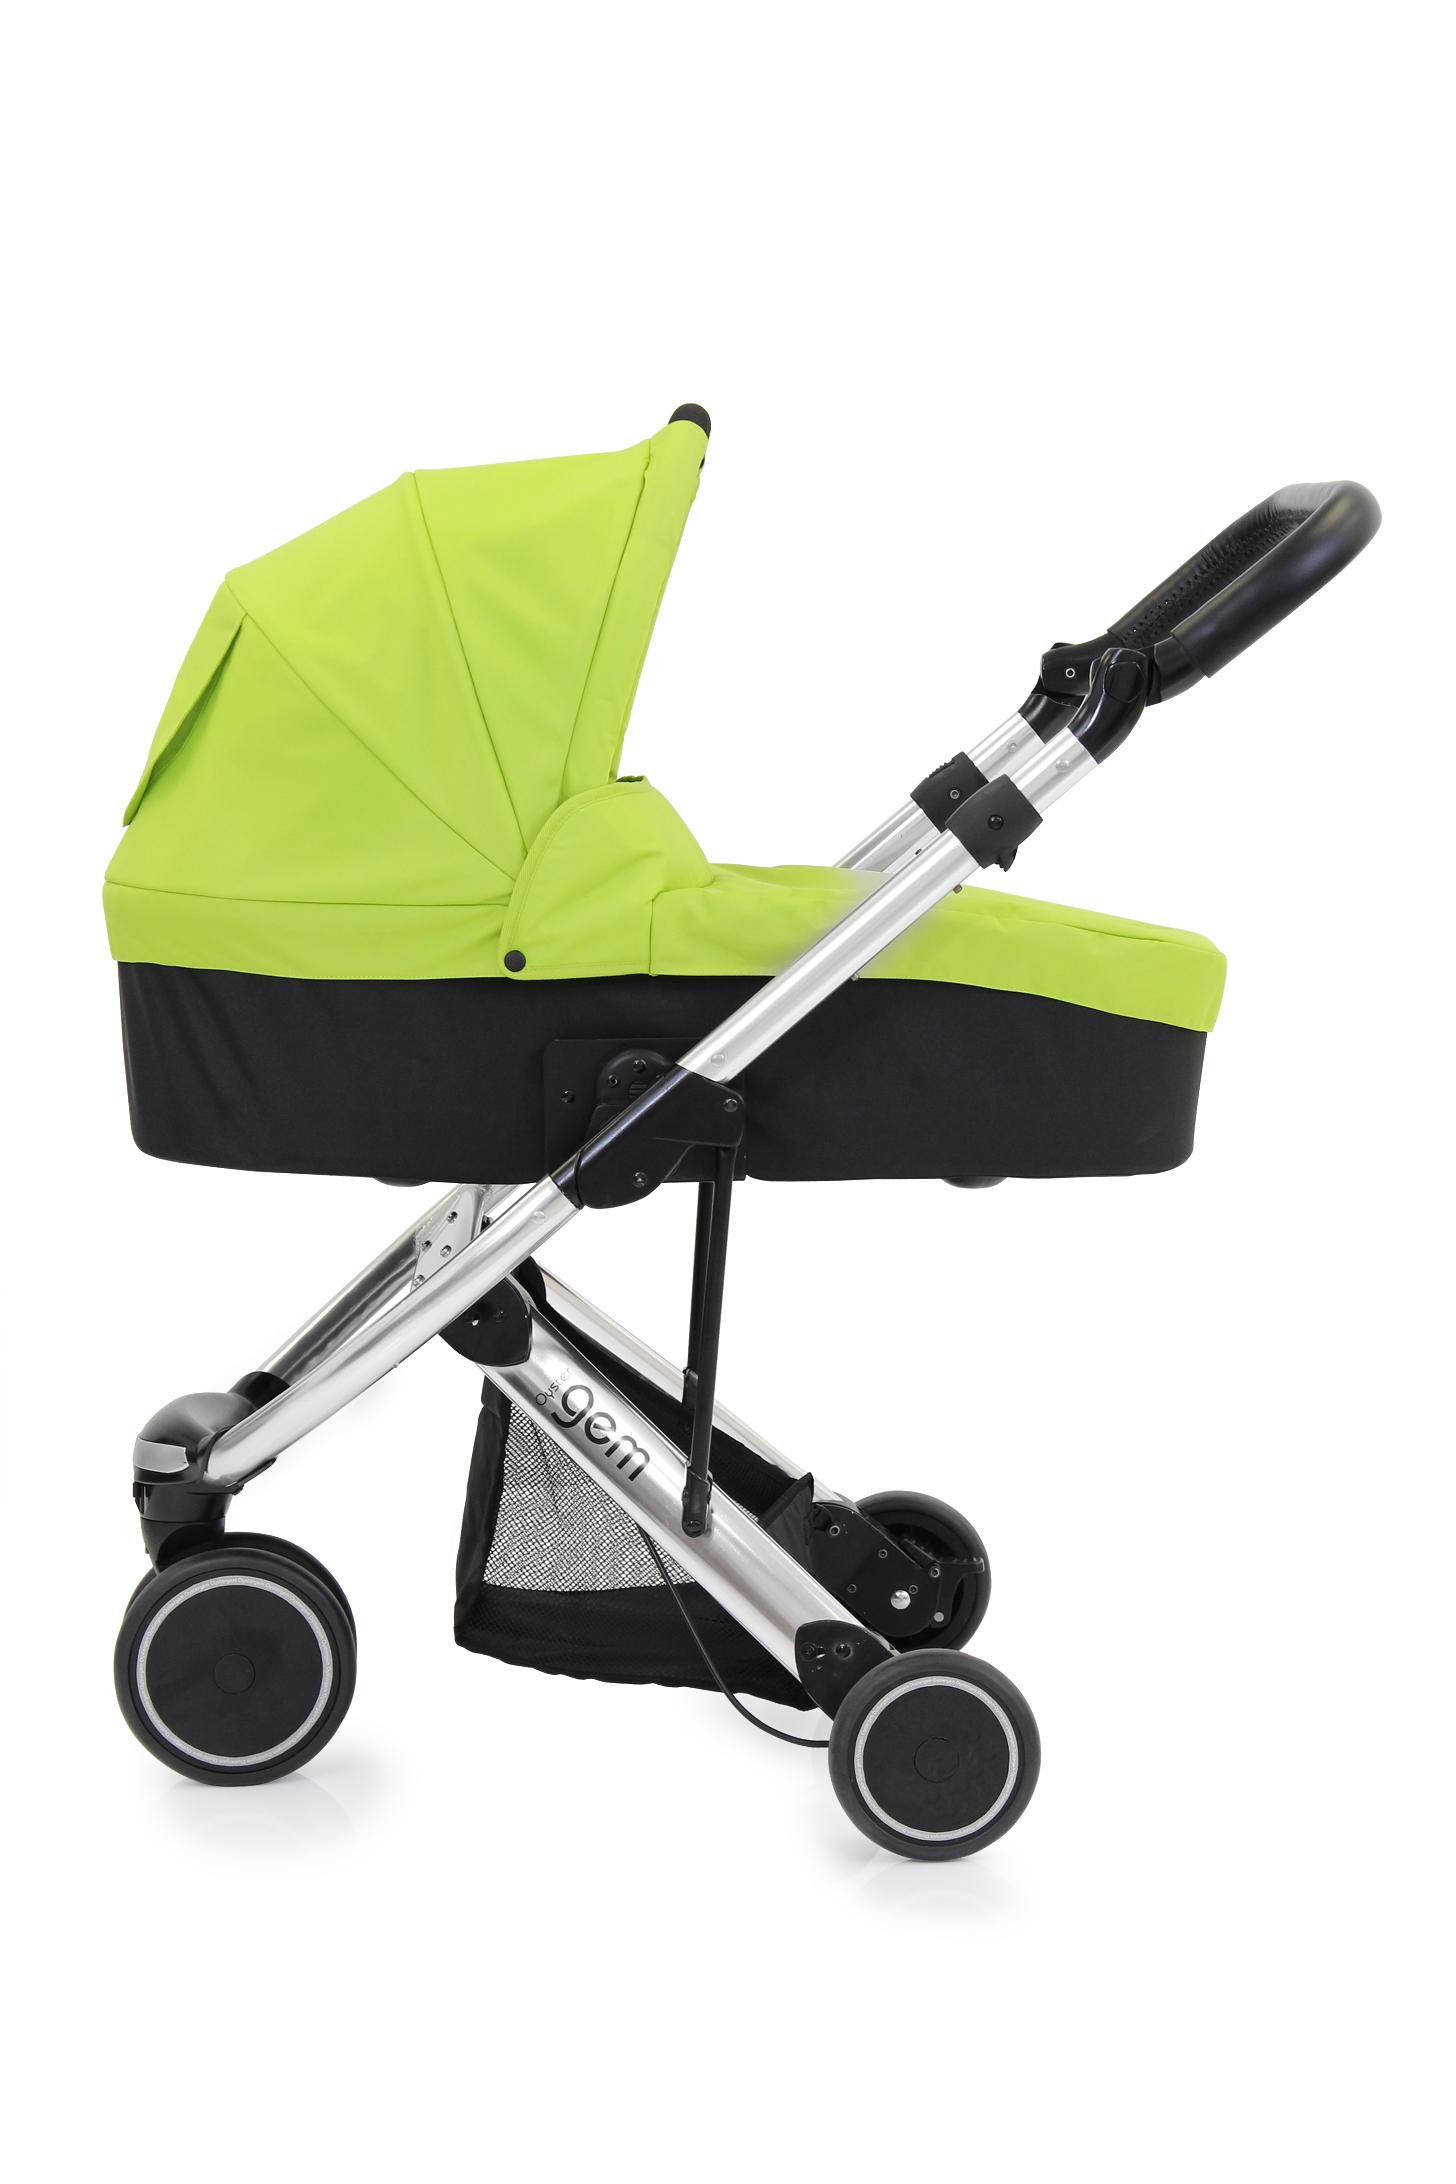 Babystyle Oyster Gem Travel System